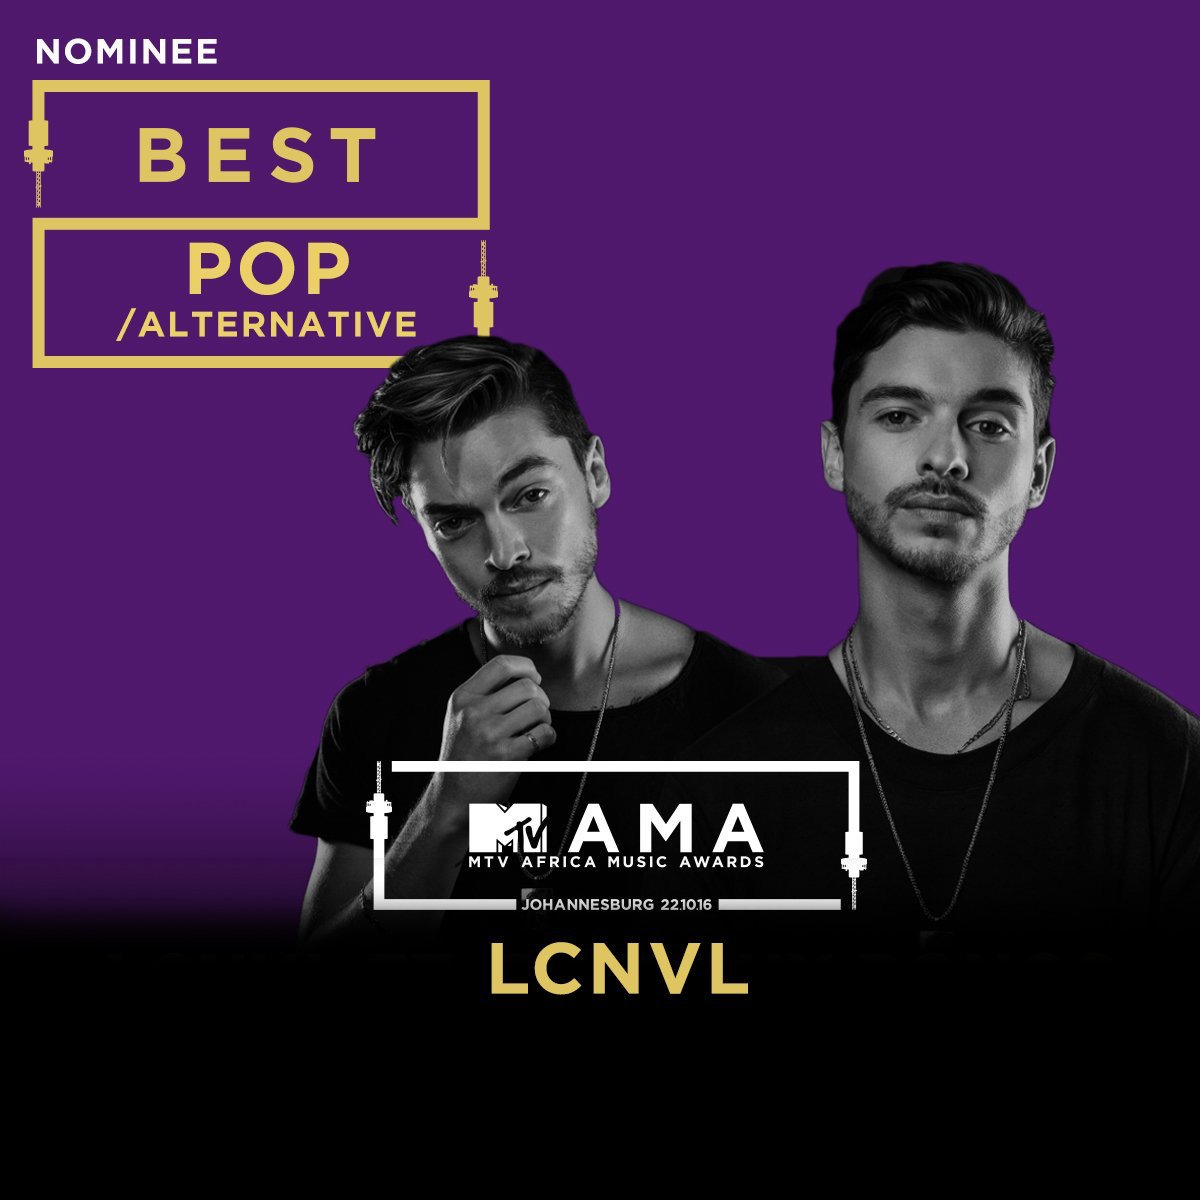 Tweet #MAMAVote @Locnville #BestPop to vote for us in the #MTVMAMA2016 https://t.co/zsxGTSoRj3